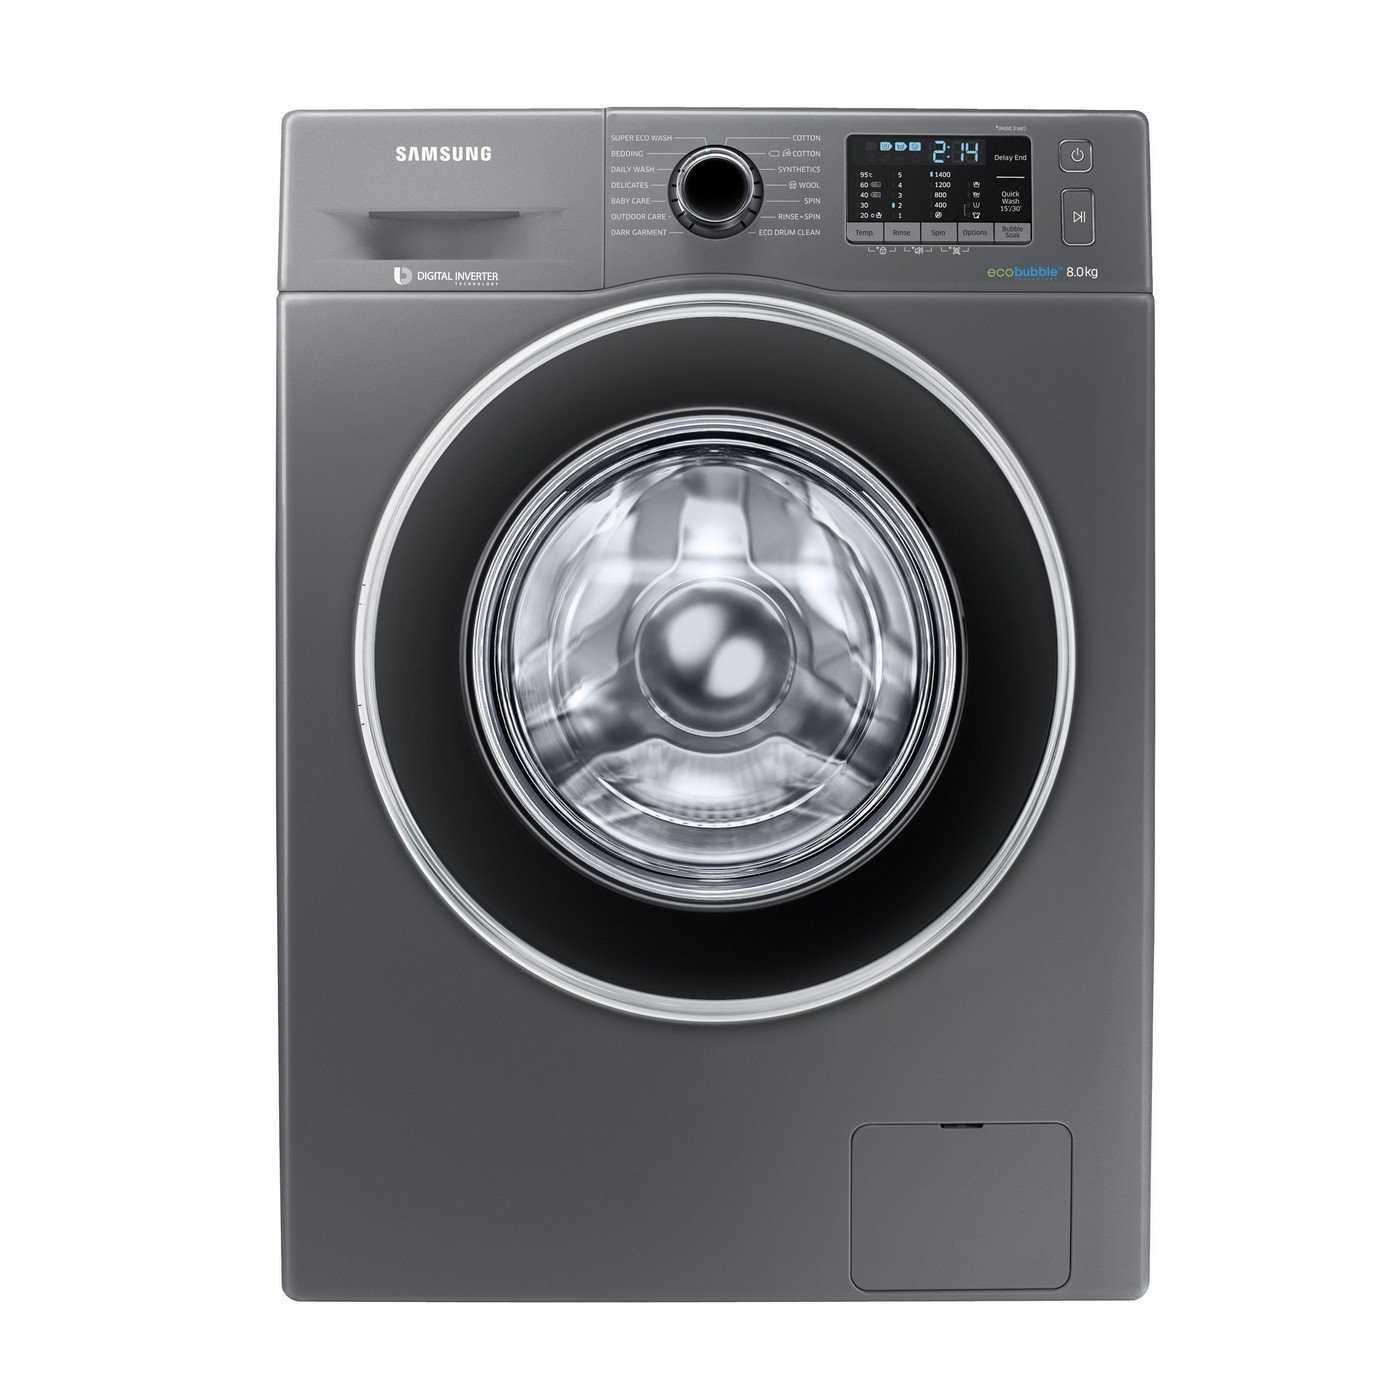 Samsung WW80J5410GX 8 Kg Fully Automatic Front Loading Washing Machine